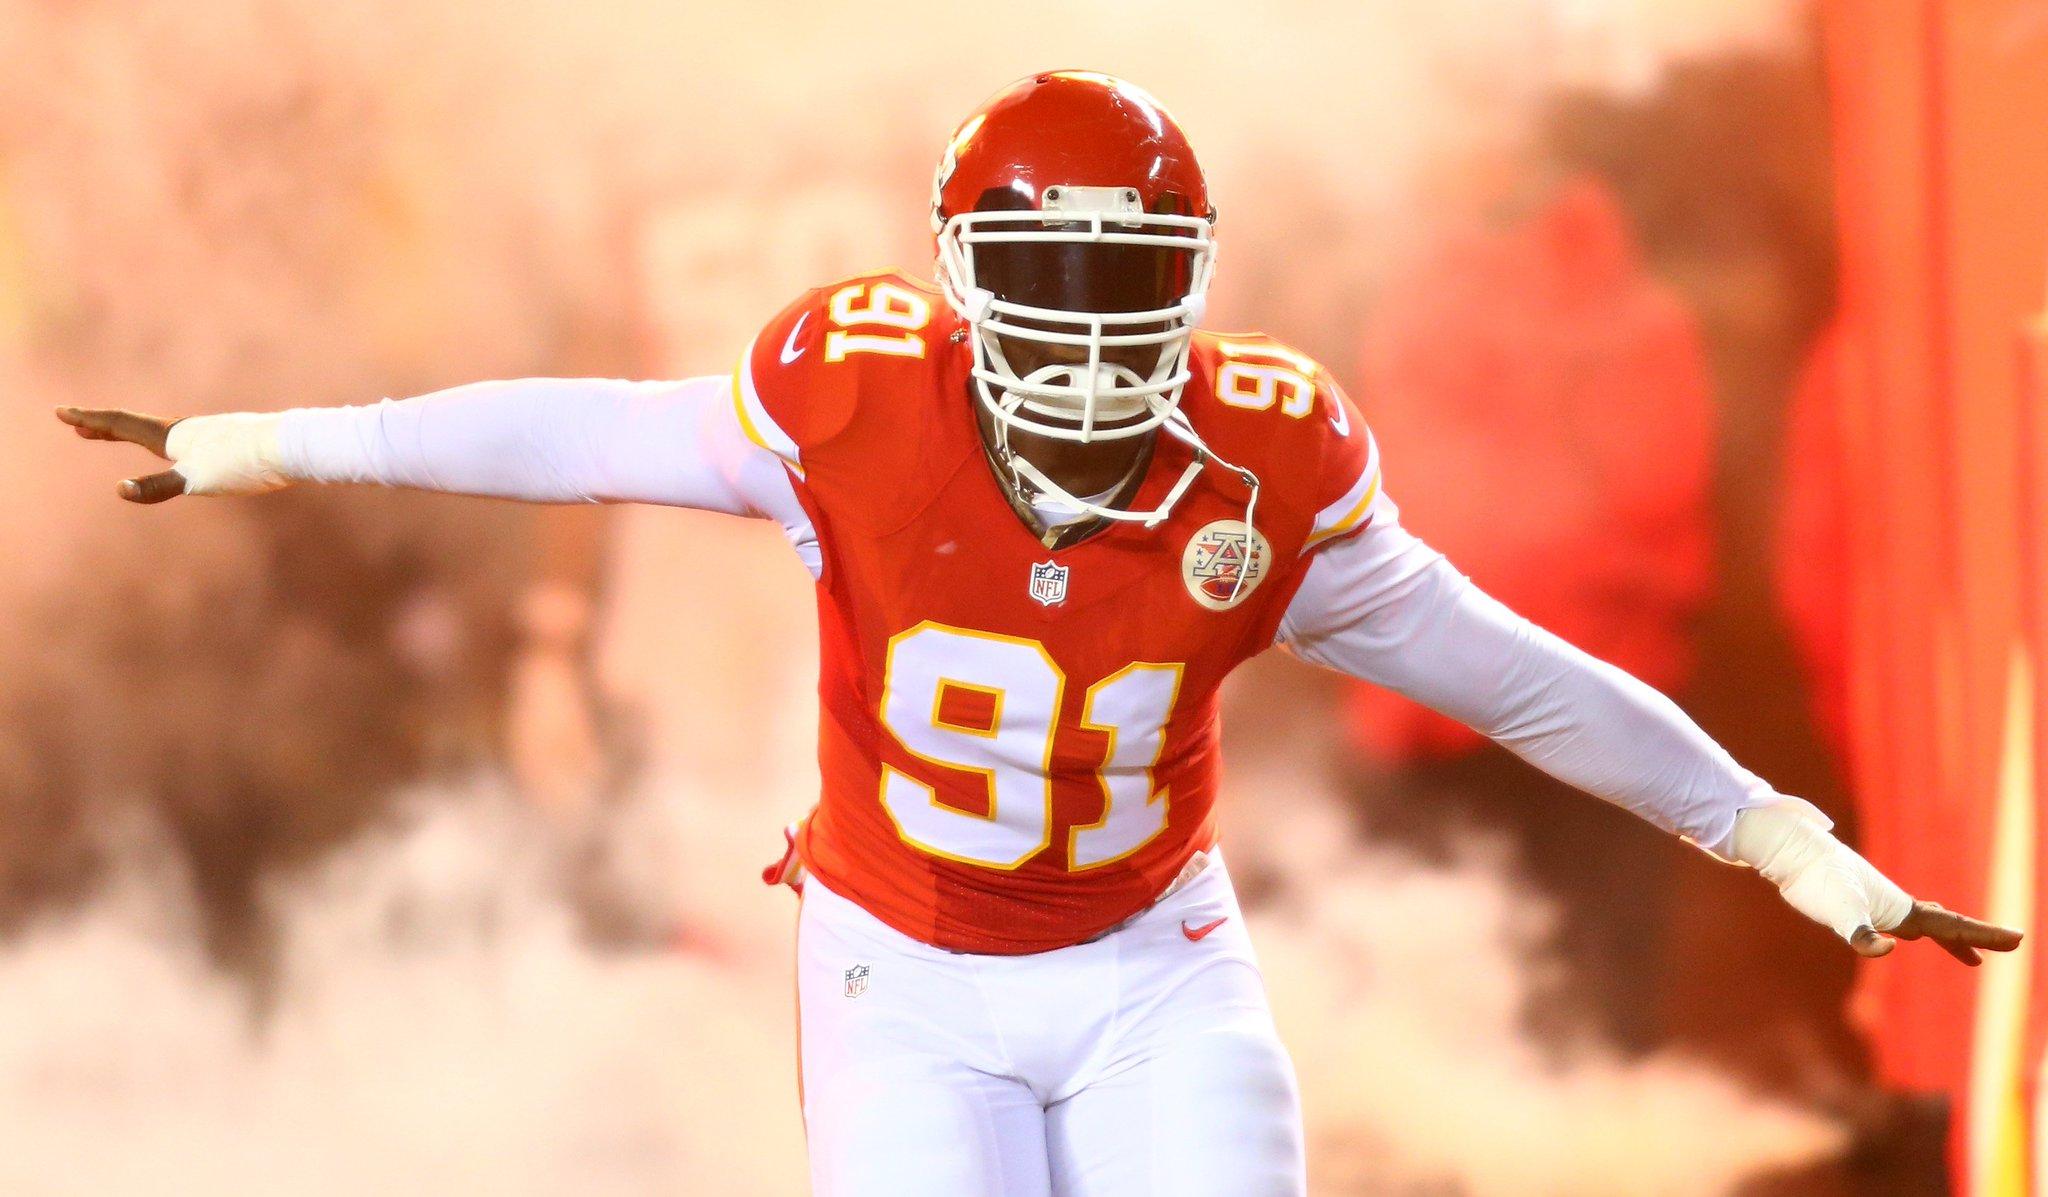 Chiefs are releasing veteran LB Tamba Hali, per @AdamSchefter https://t.co/7hPP8qjF8R